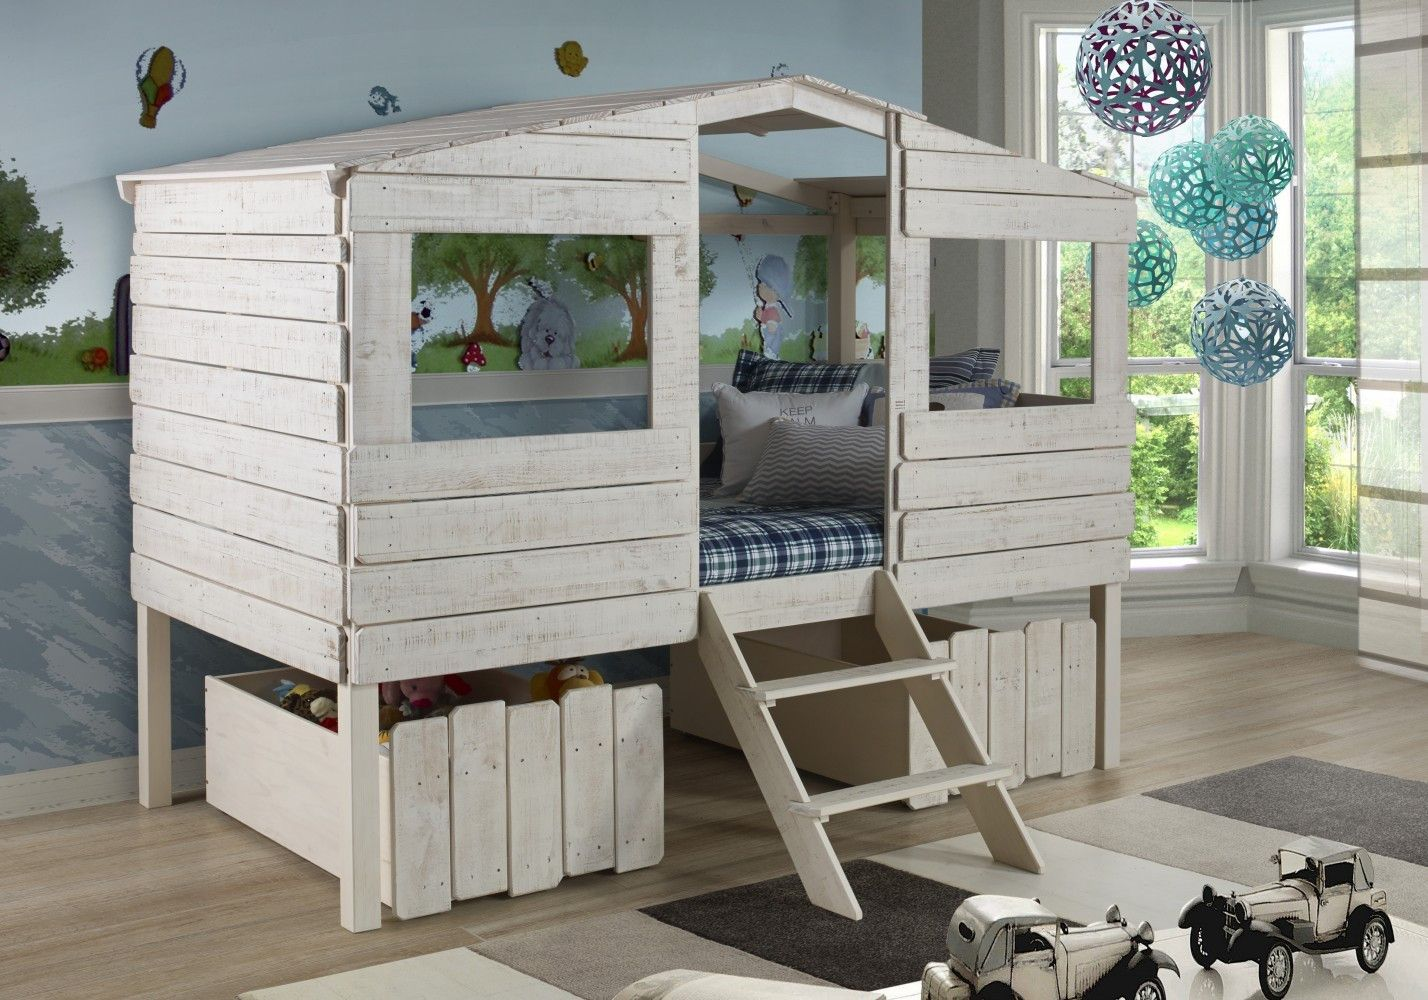 Custom loft bed ideas  Liam White Club House Loft Beds with Storage Drawers  Storage